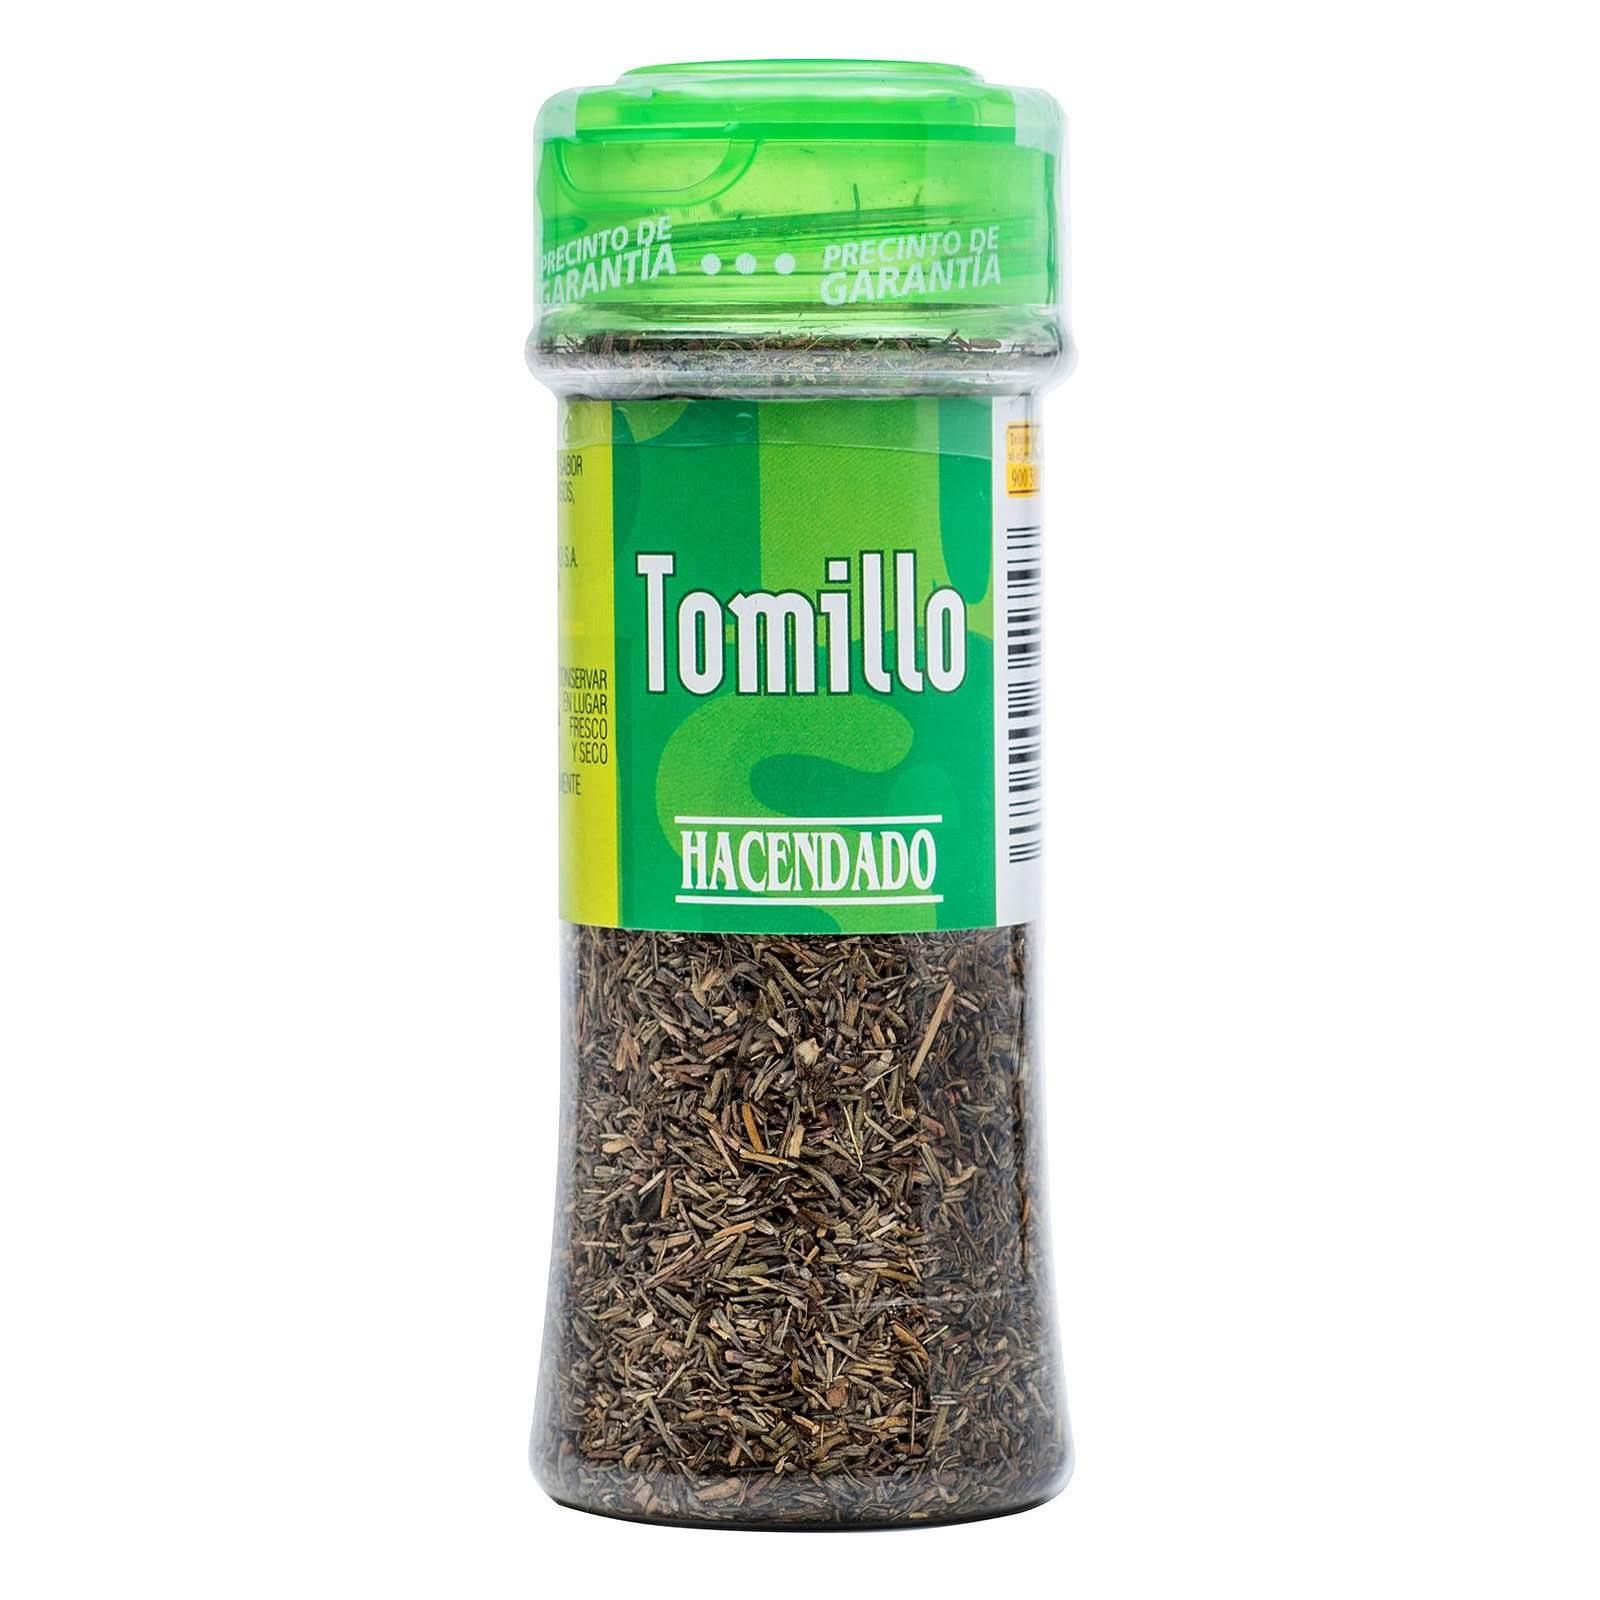 Tomillo Hacendado